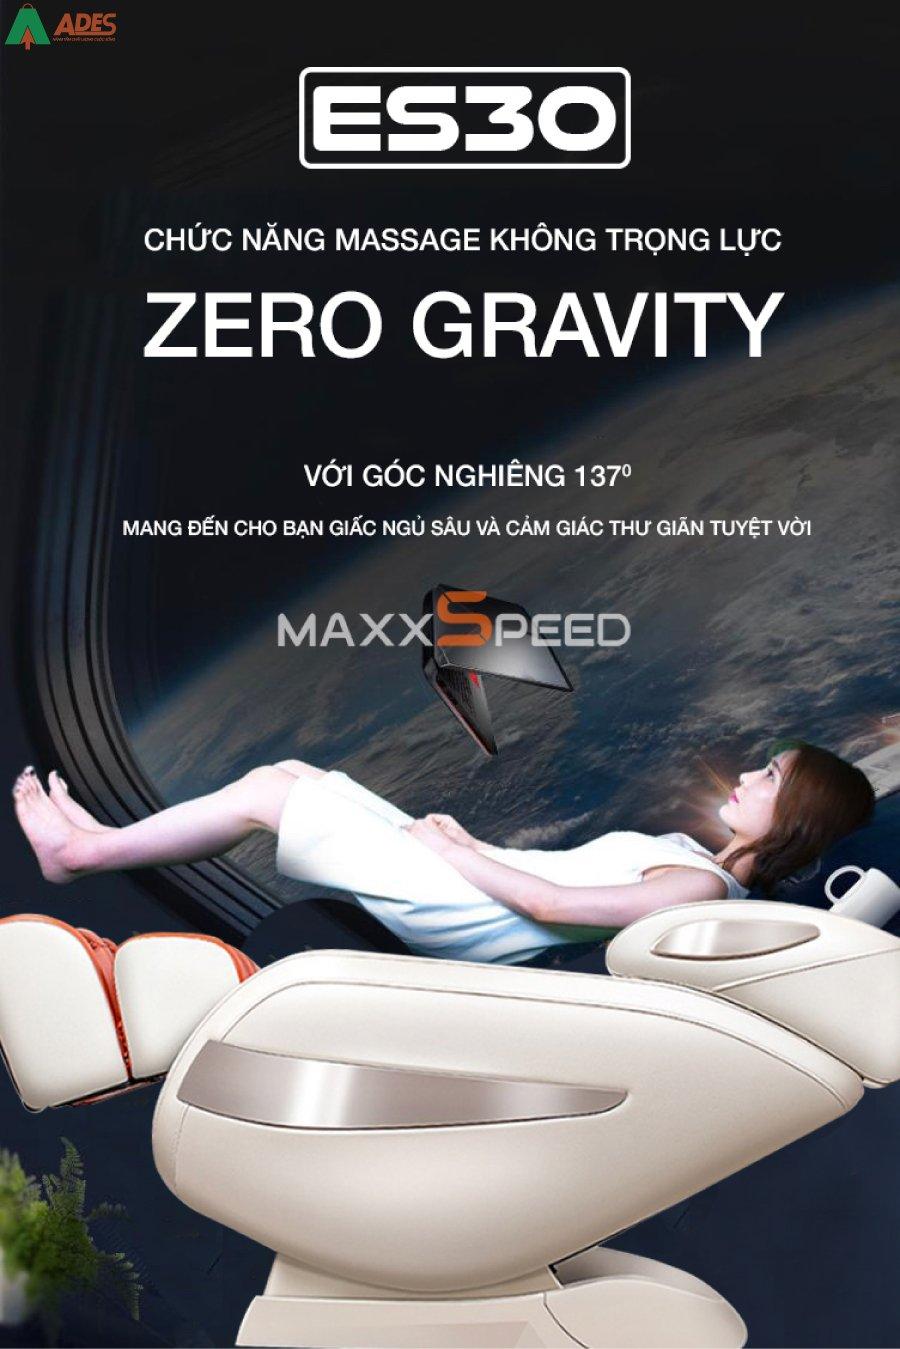 Azaki Maxxspeed ES30 co Chuong trinh massage khong trong luc Zero Gravity